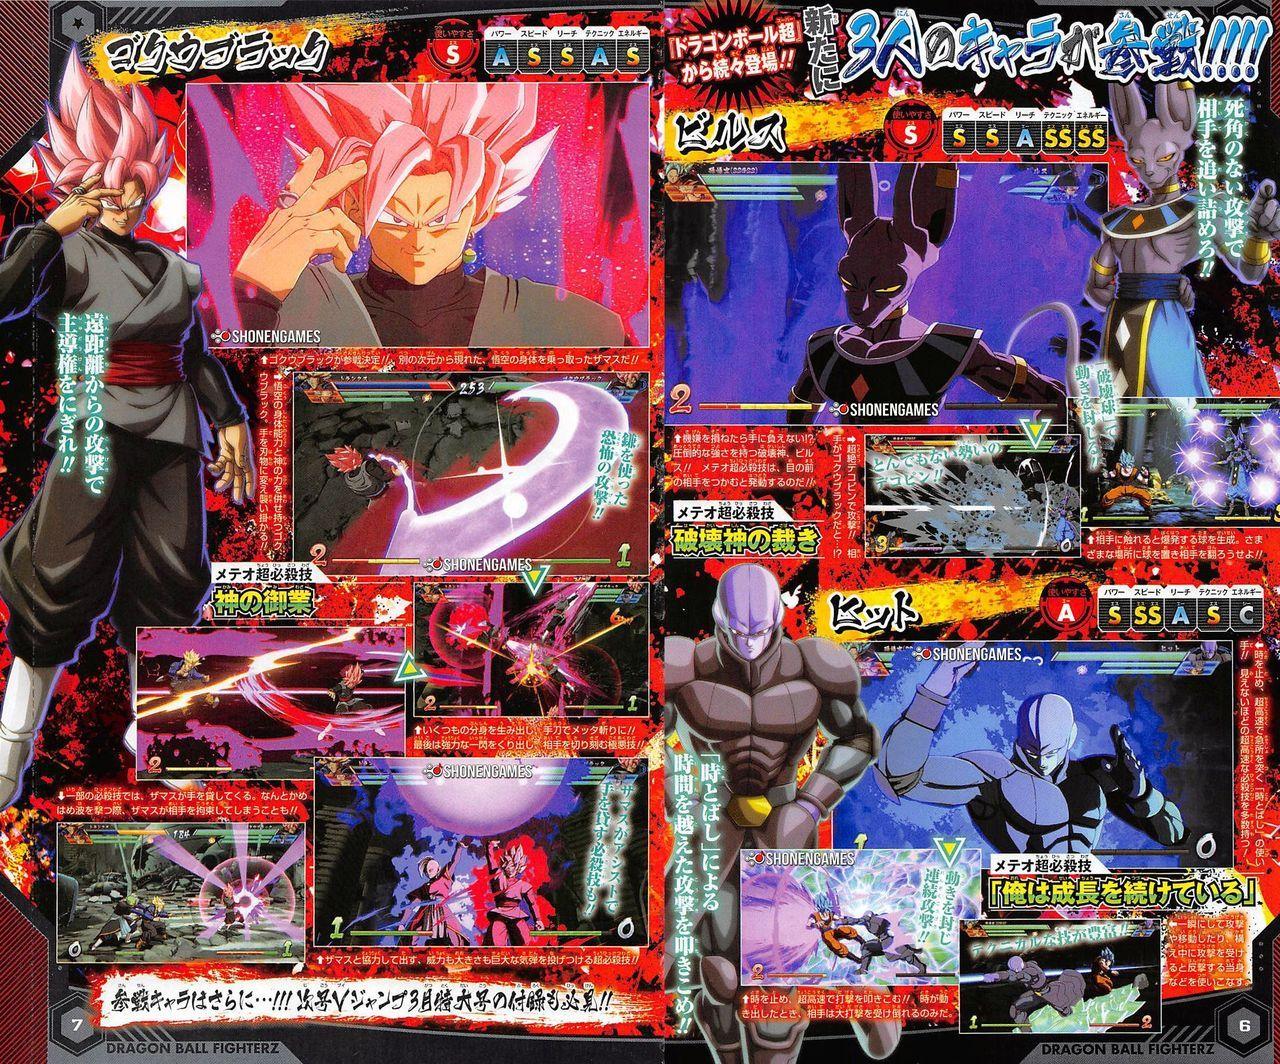 beerus1-hit-goku-black-seran-personajes-jugables-dragon-ball-fighterz-frikigamers.com